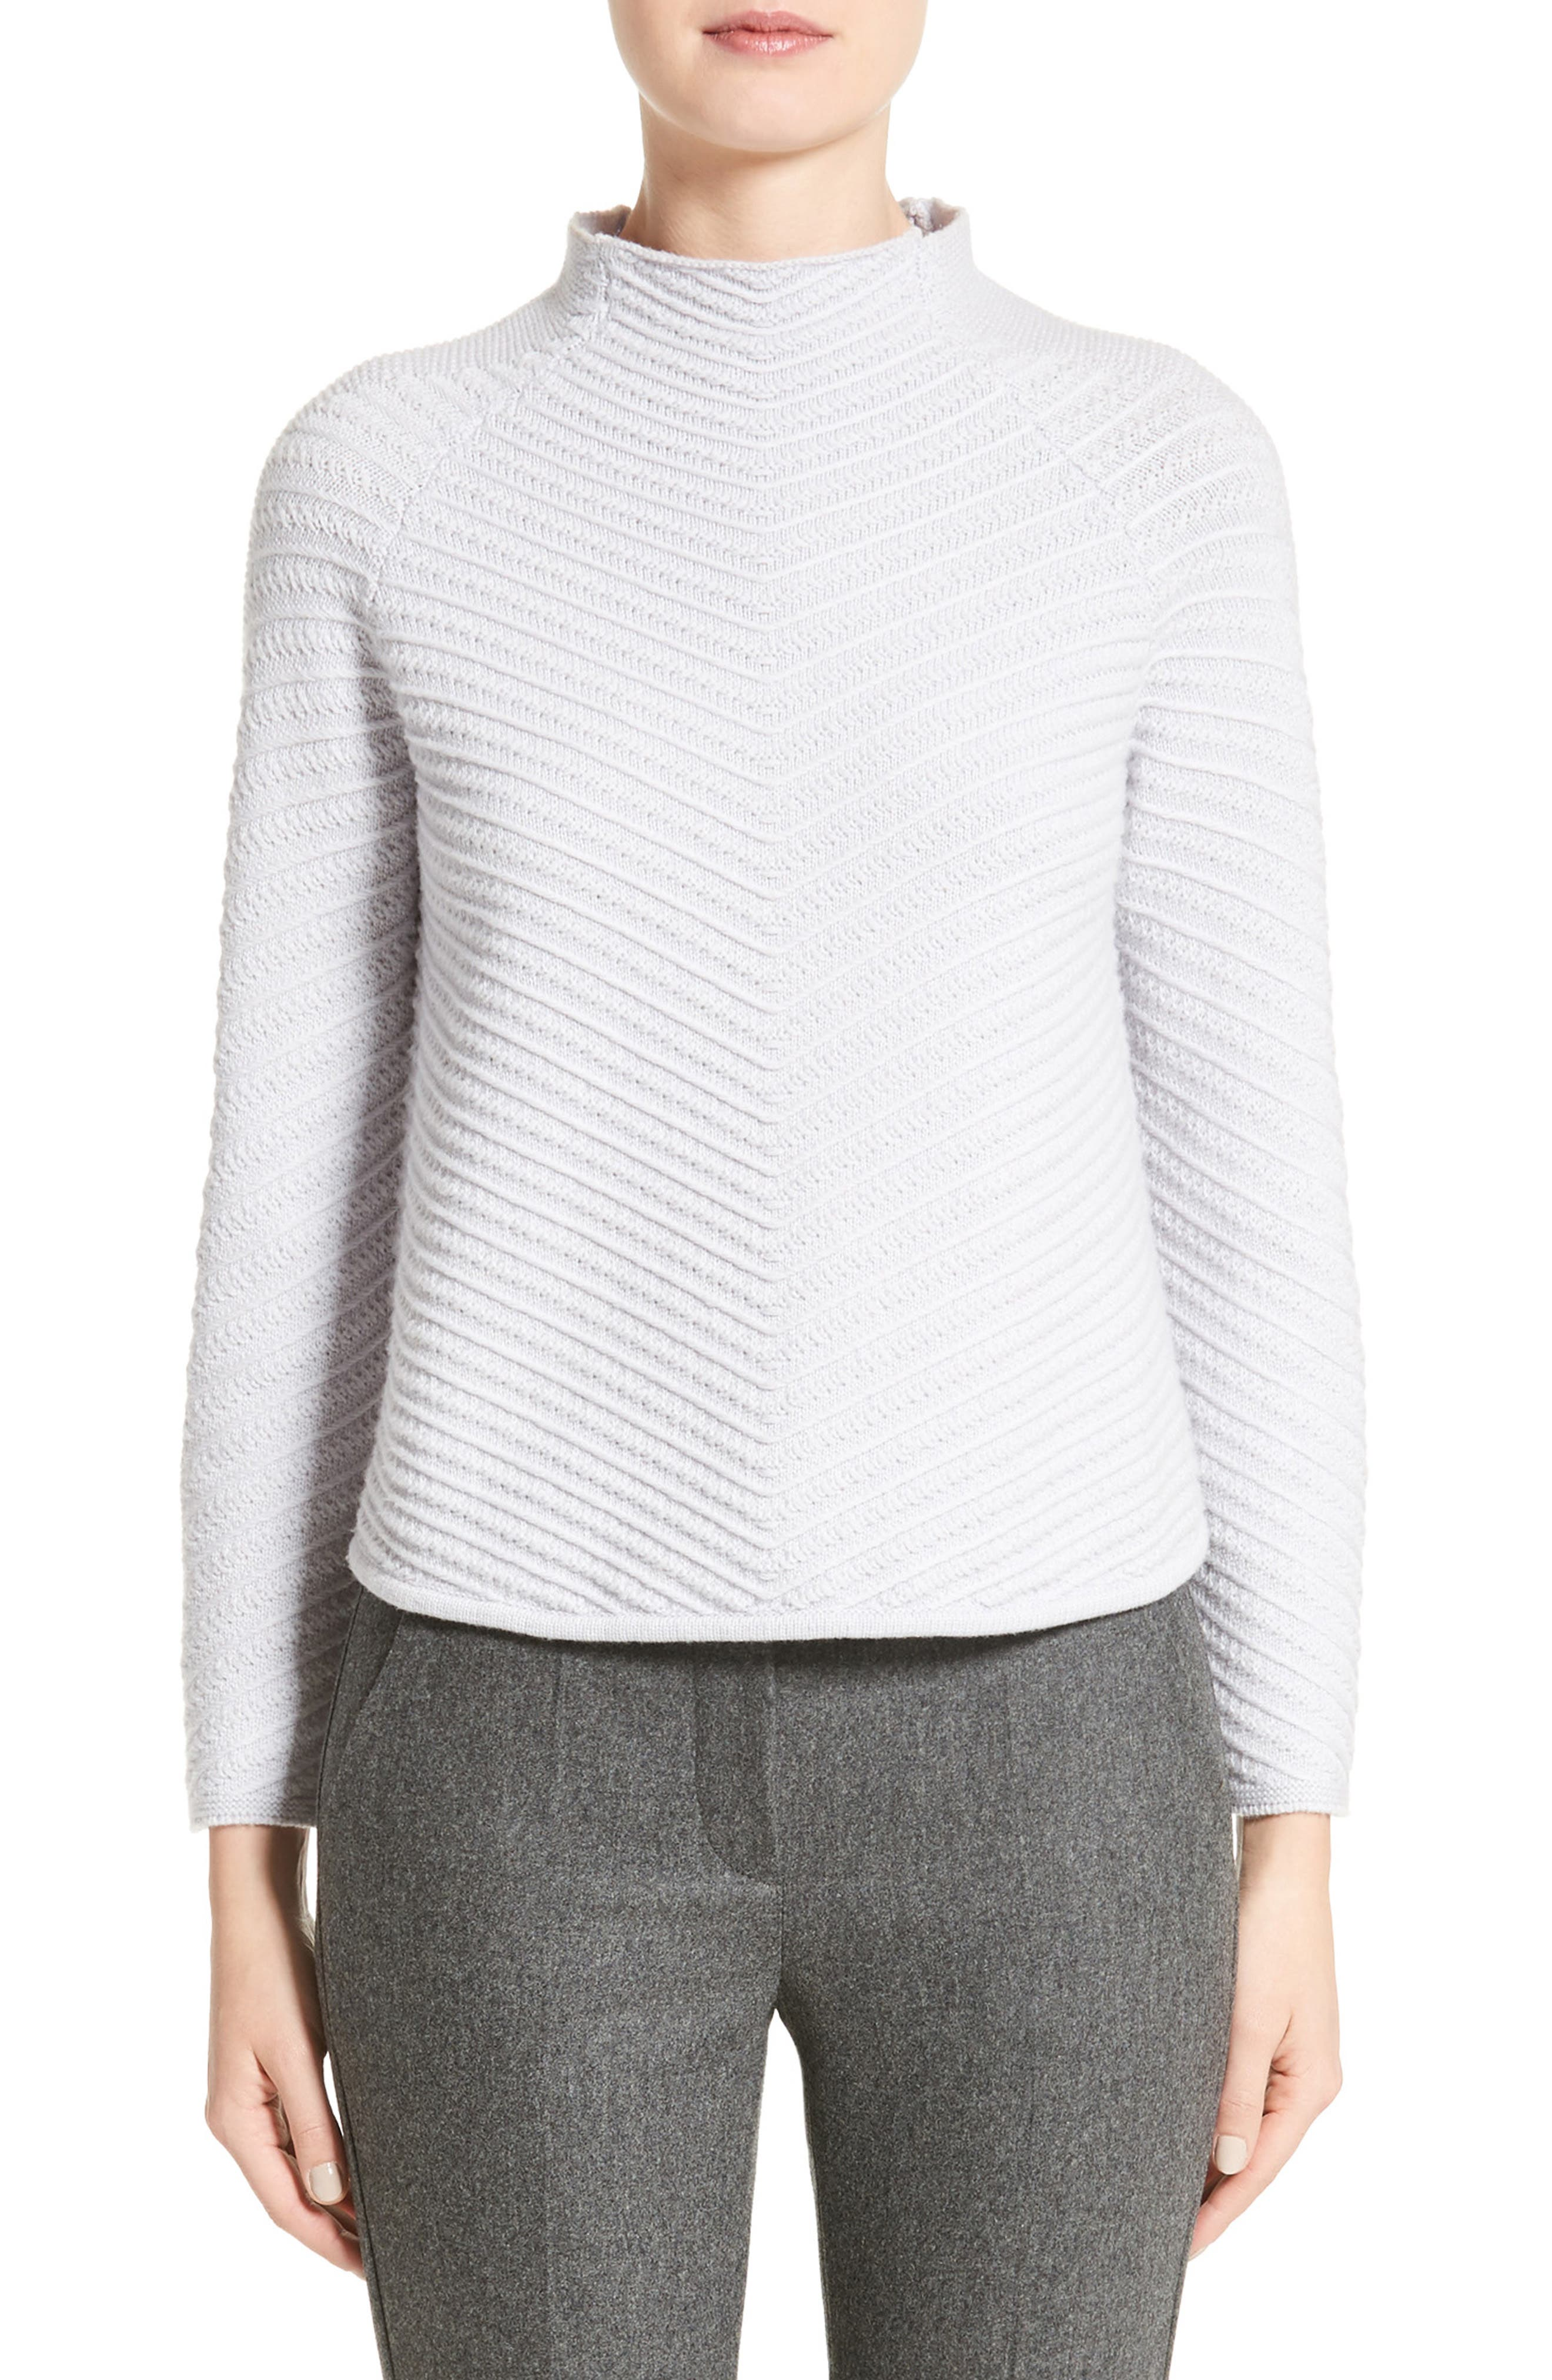 Armani Collezioni Wool & Cashmere Blend Sweater